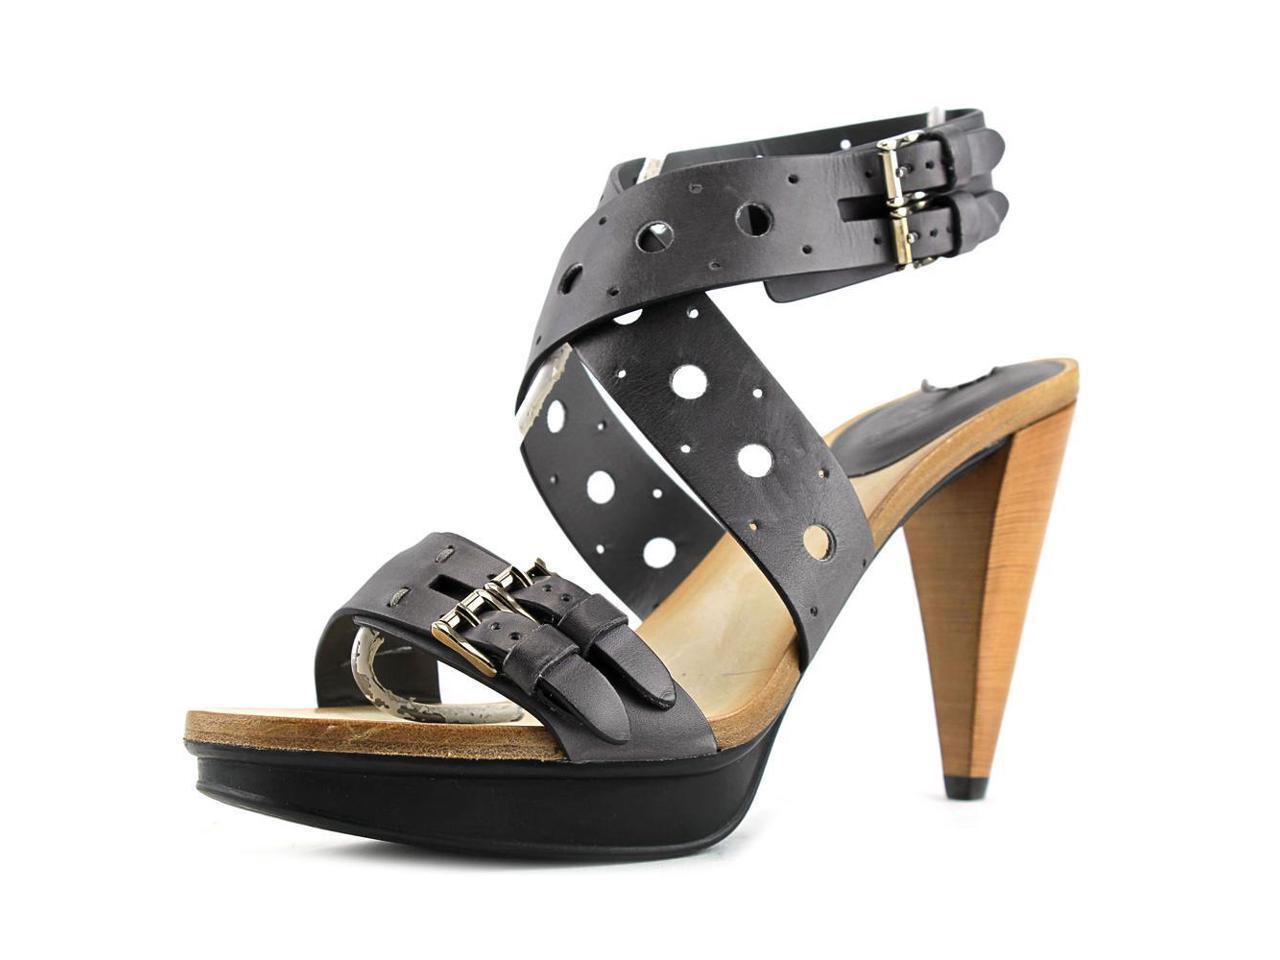 ¡Nuevo! Tod's Sasha GOMMA Sandalo Forature Punta Abierta de Cuero Talla: Eu 39 /